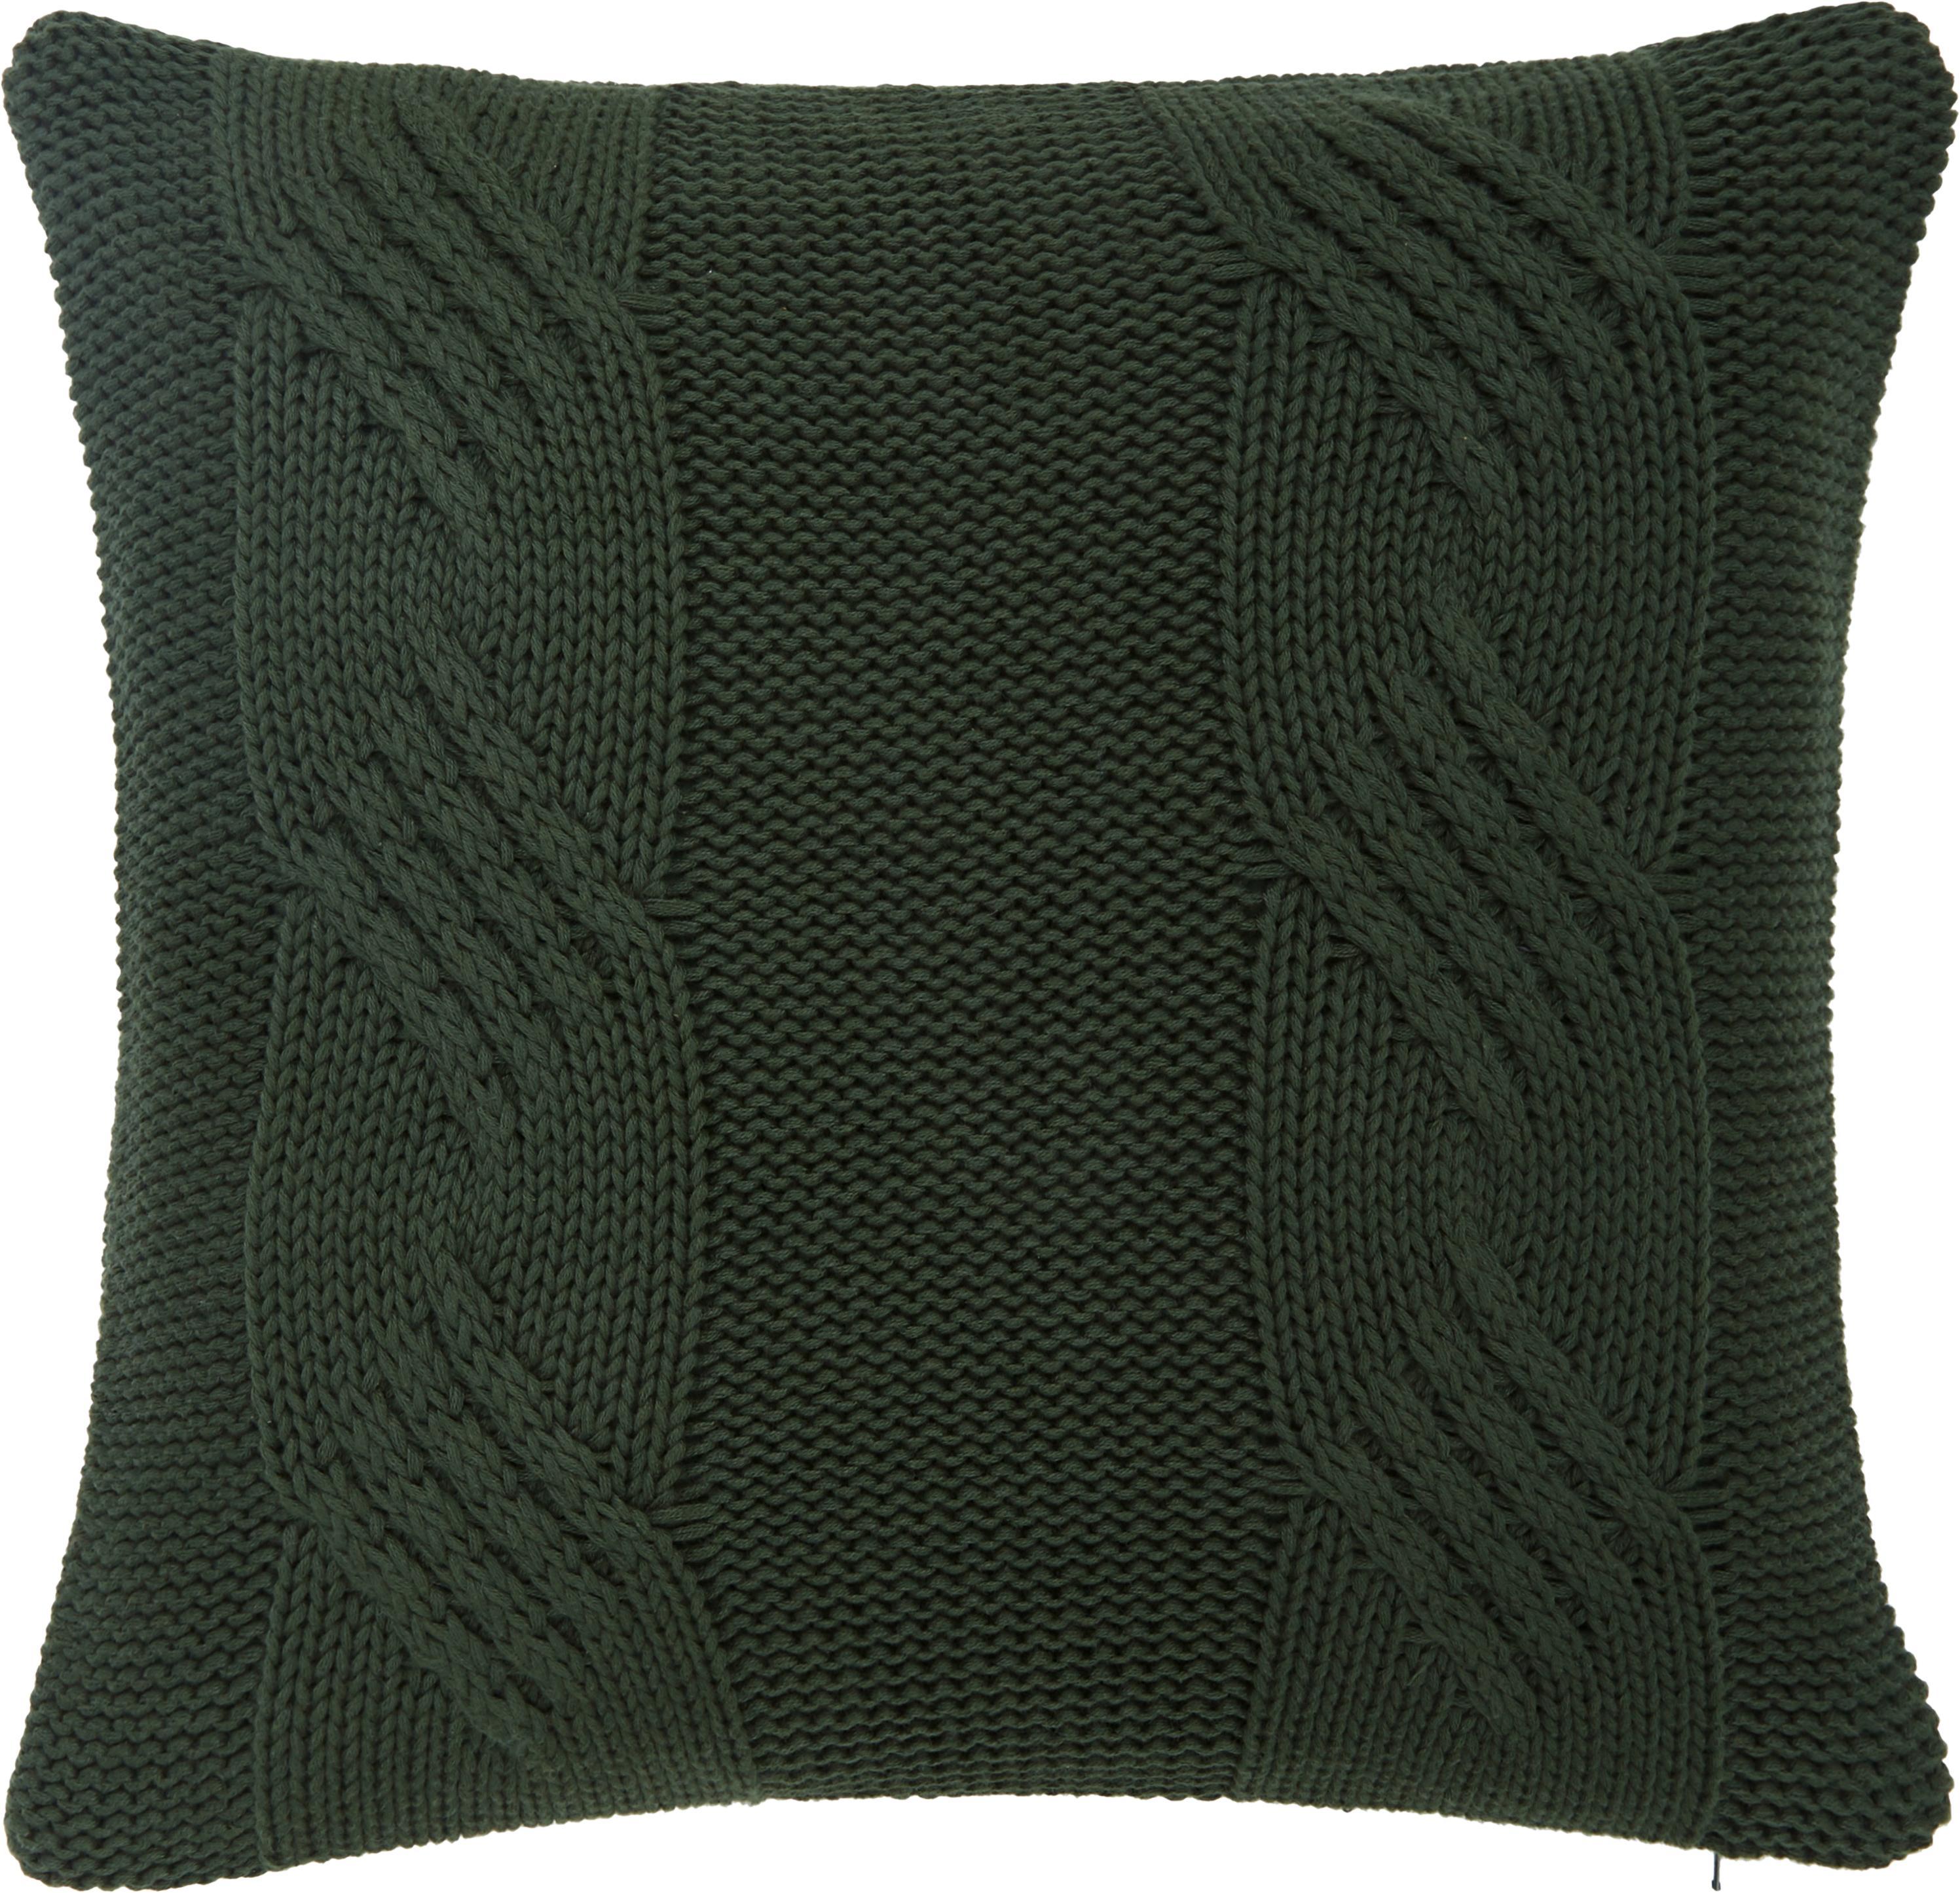 Strick-Kissenhülle Jonah mit leichtem Zopfmuster, 100% Baumwolle, Dunkelgrün, 40 x 40 cm